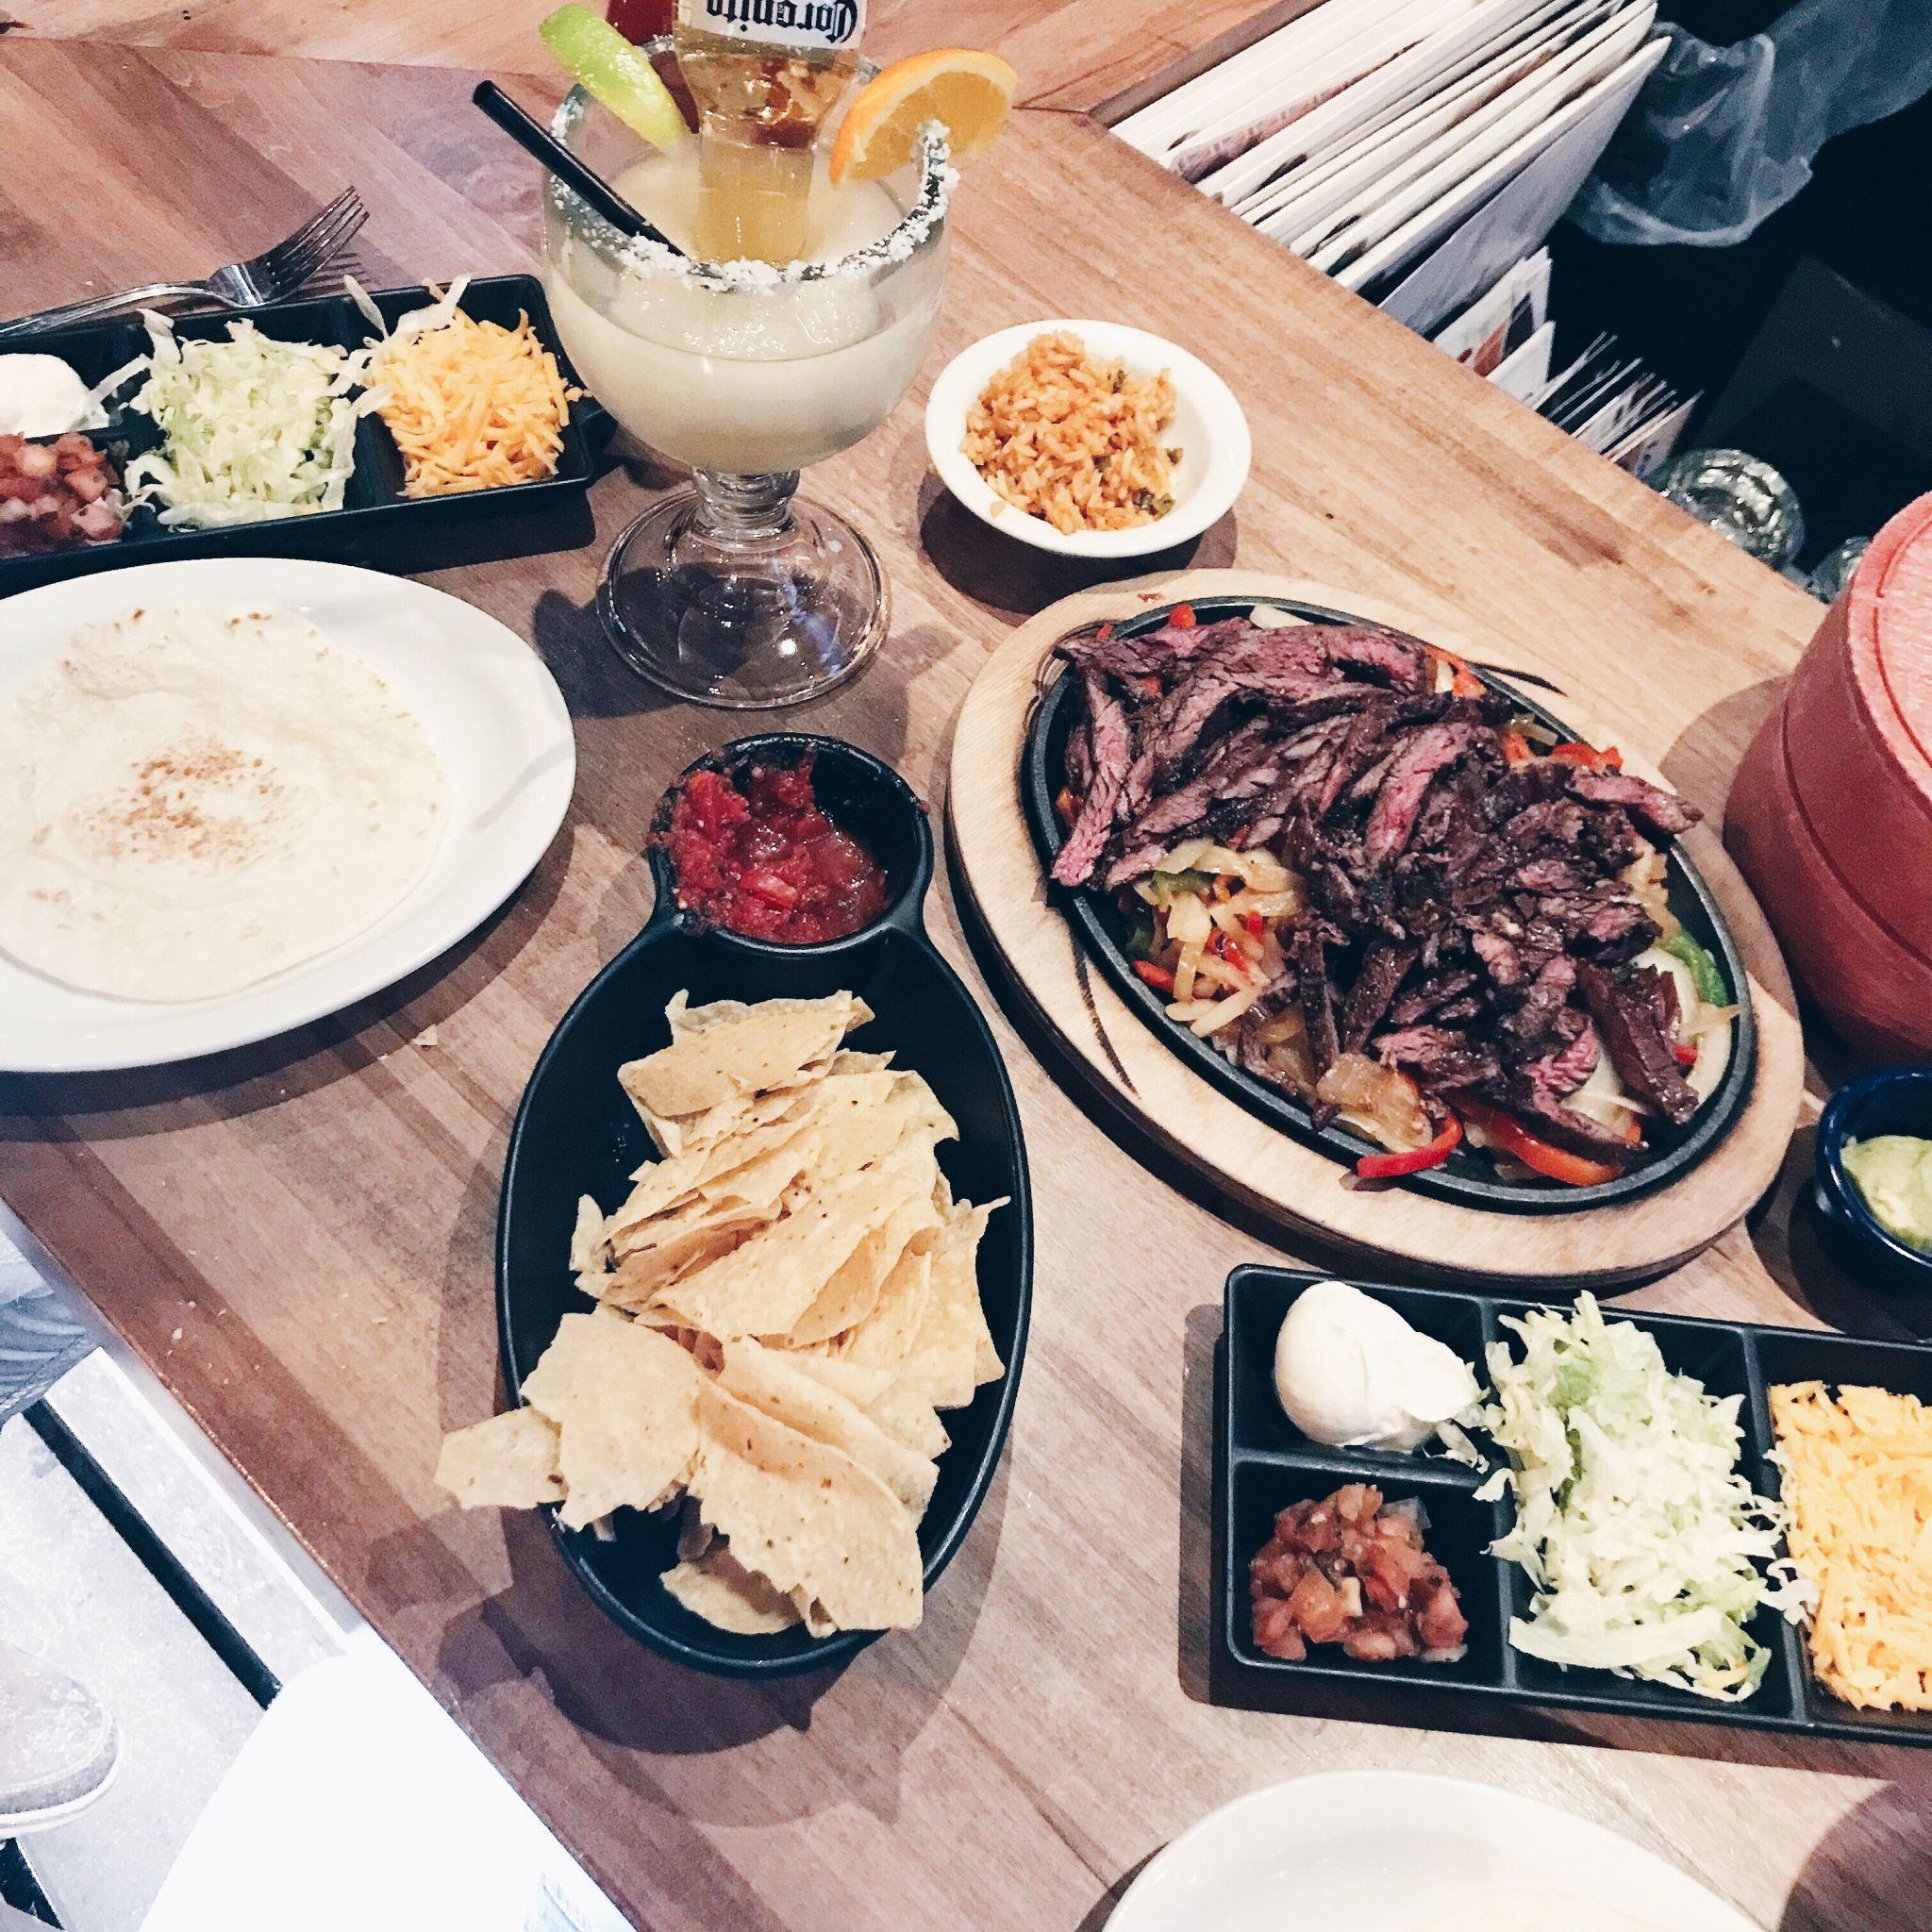 lonestar fajitas ottawa, lifestyle blogger life with aco, weekend recap winter